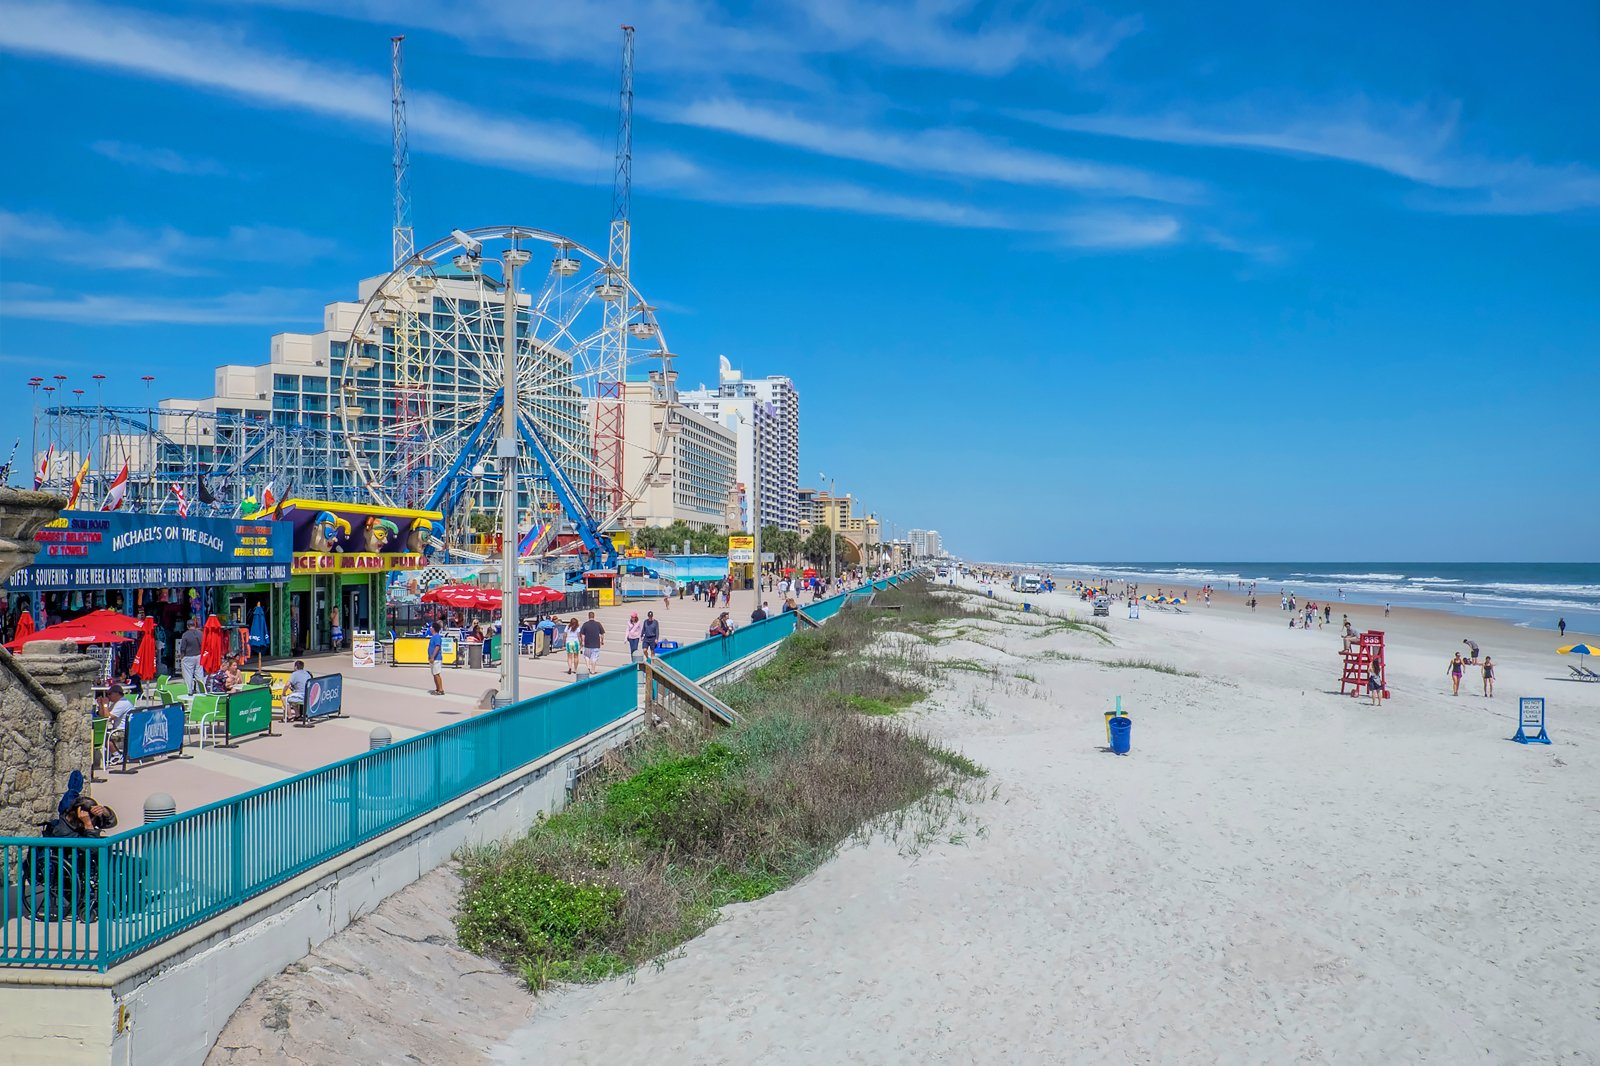 Family Things To Do In Daytona Beach